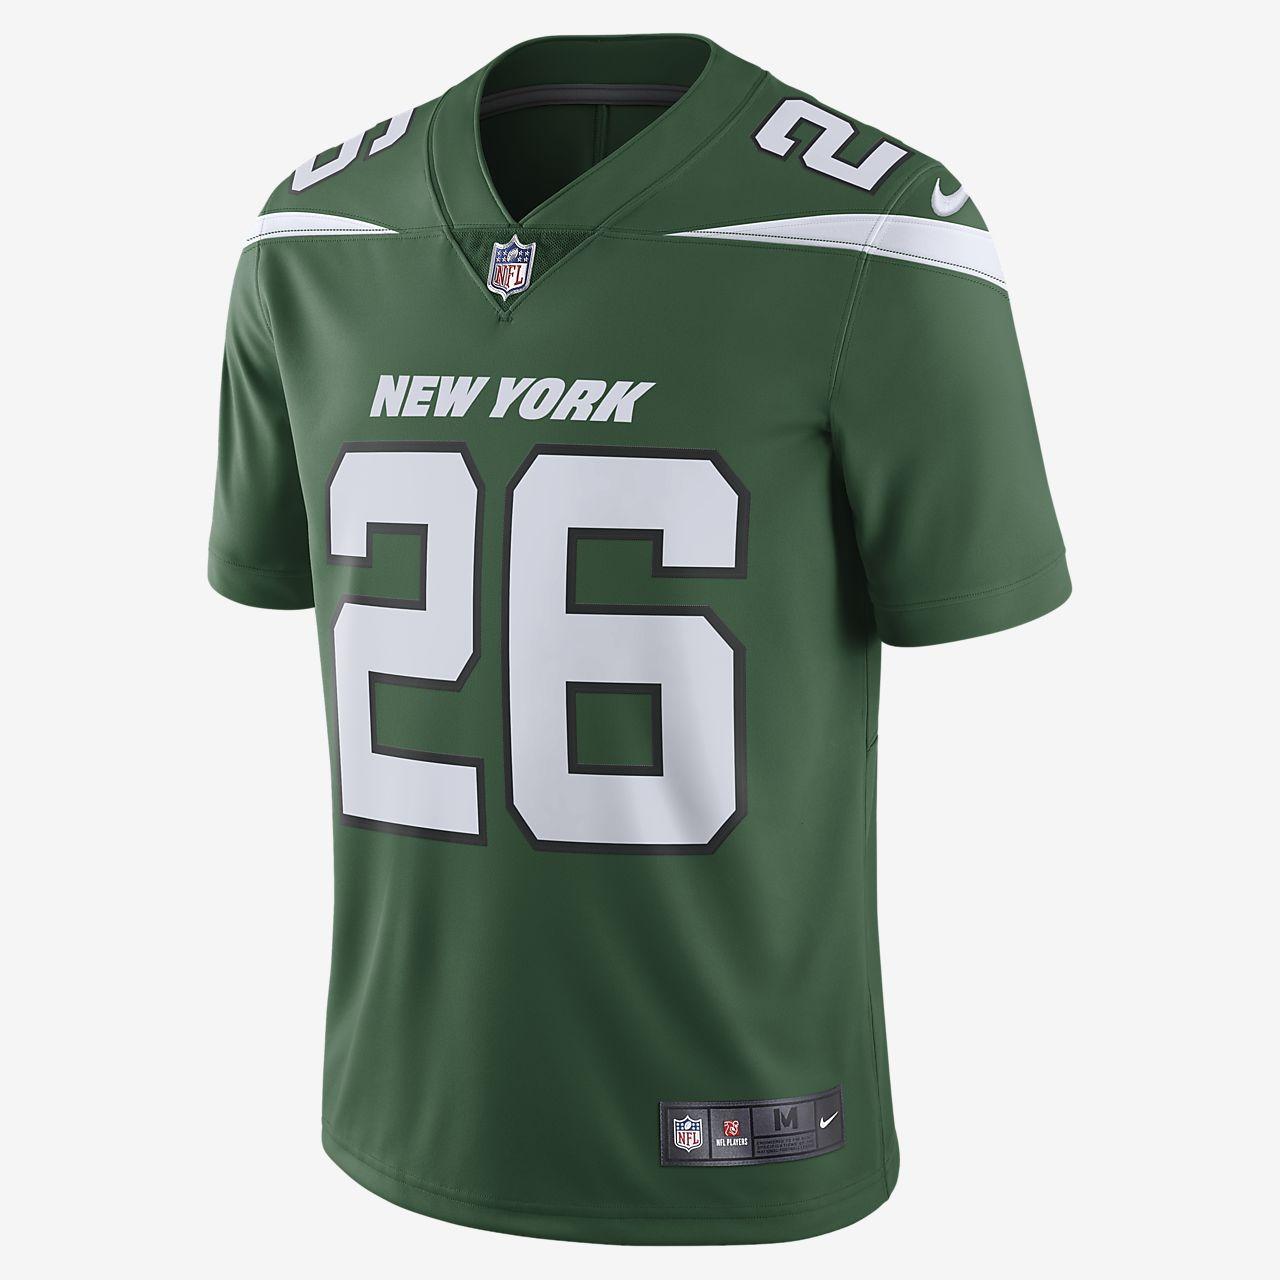 NFL New York Jets (Le'Veon Bell) Men's